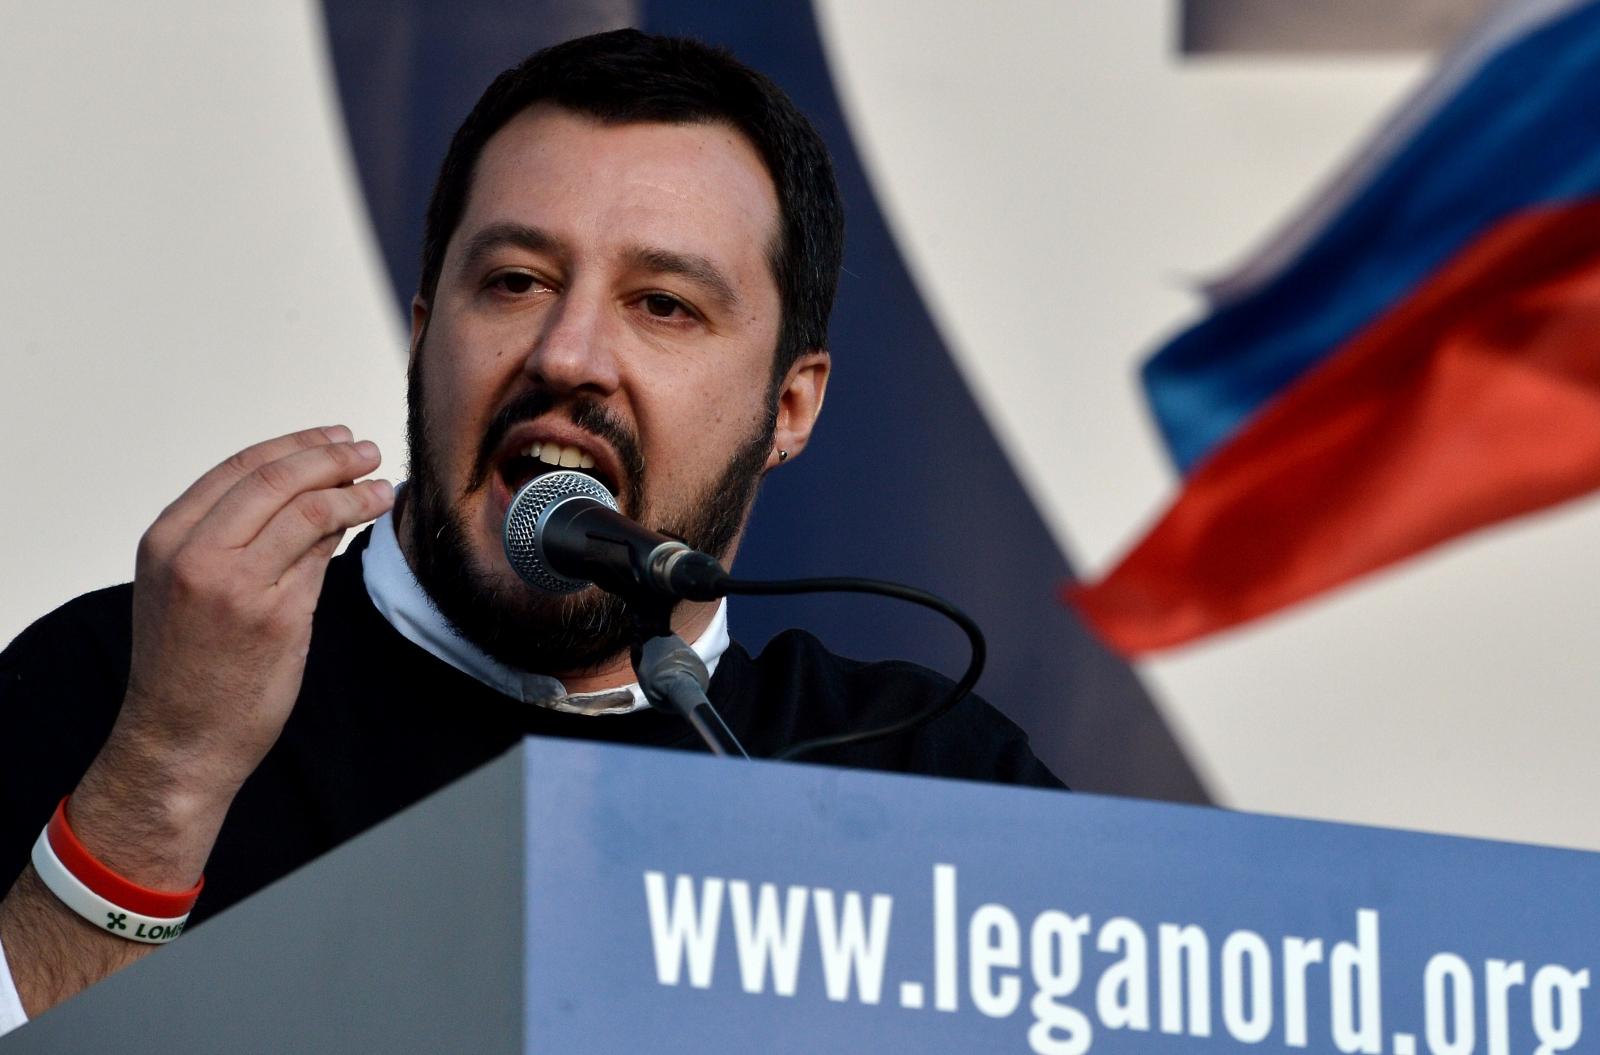 Matteo Salvini at a rally